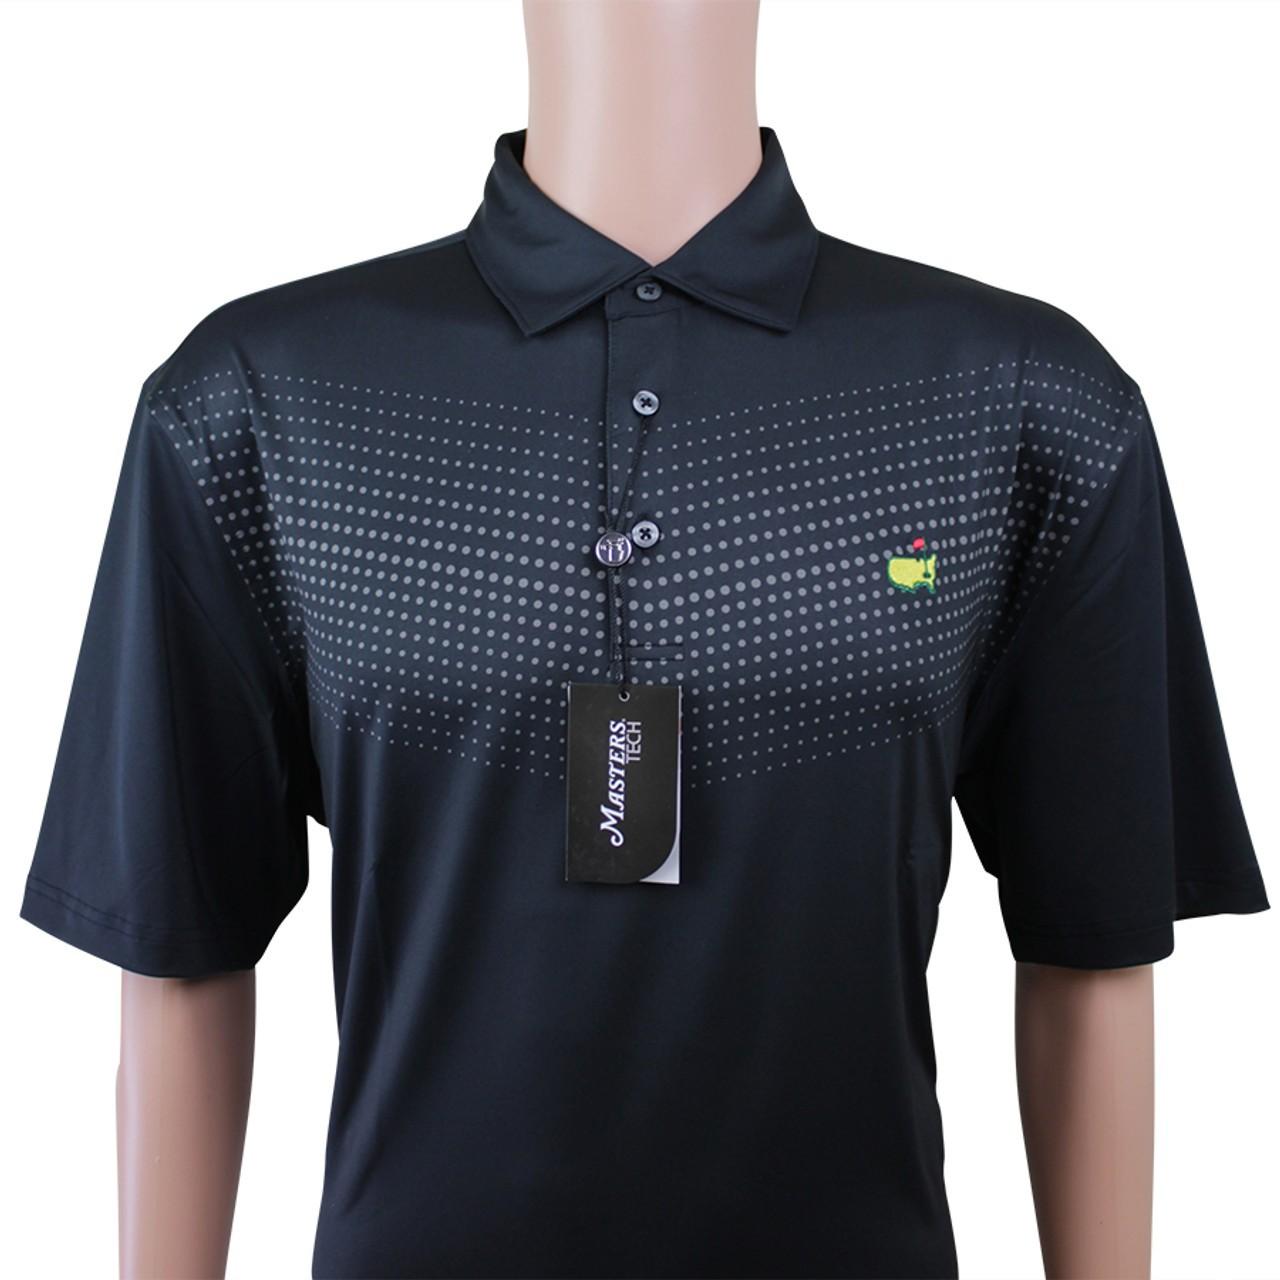 c3fa9959c16 Masters Black Dotted Pattern Performance Tech Golf Shirt